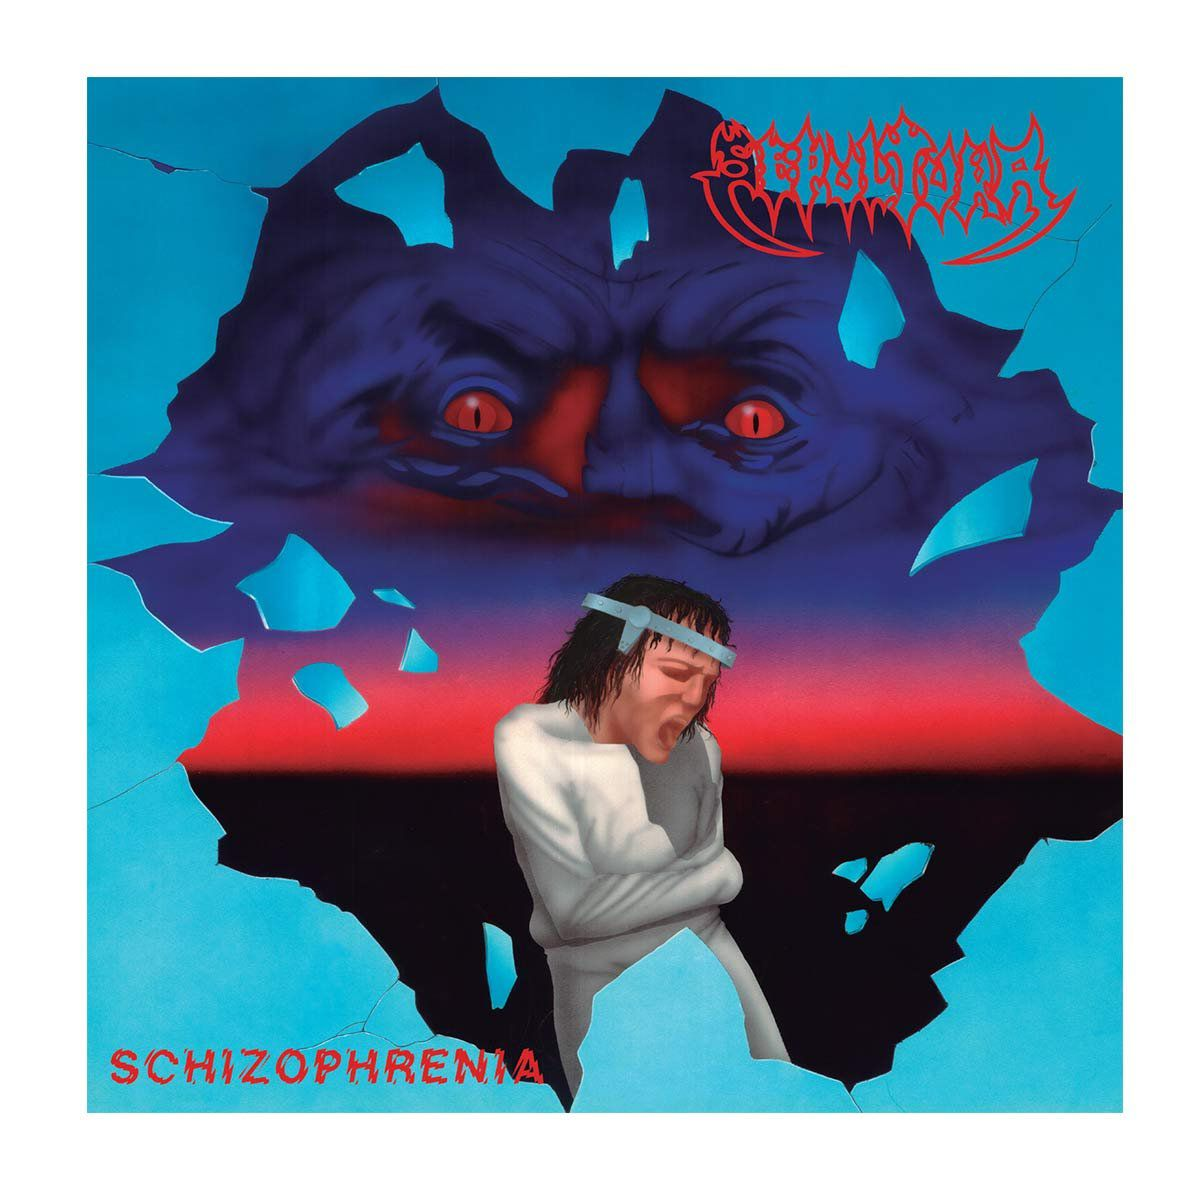 LP Sepultura Schizophrenia  - bandUP Store Marketplace